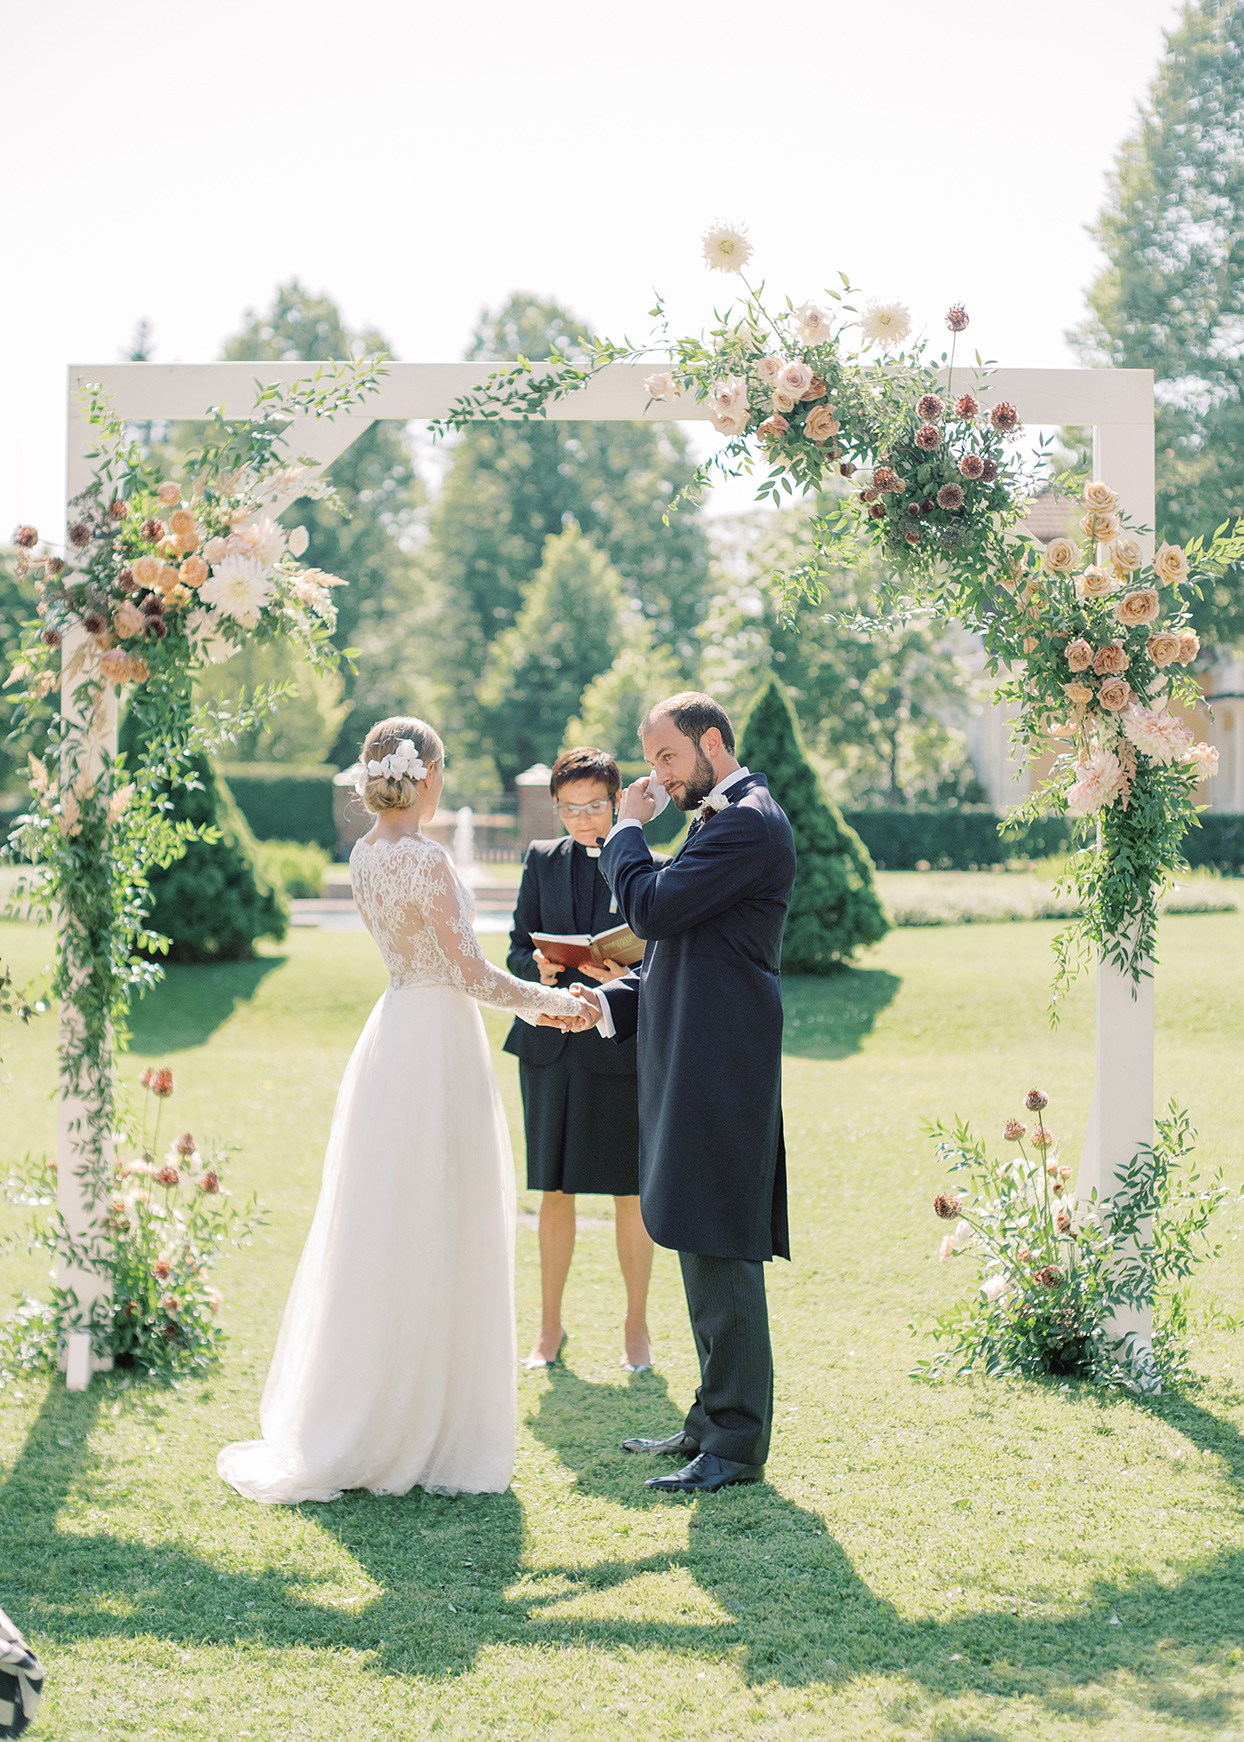 laura alexander wedding ceremony outdoors